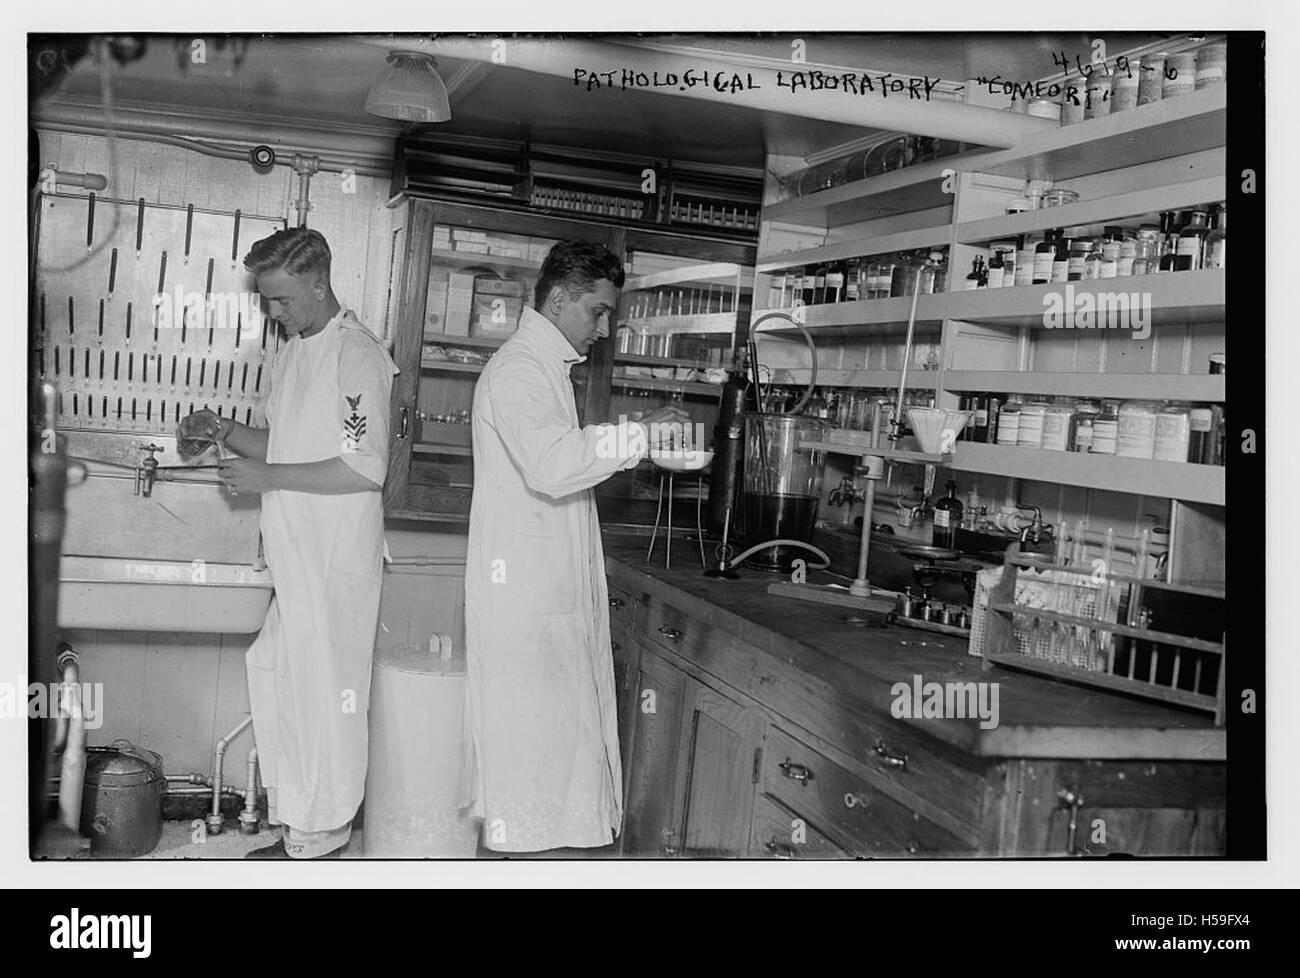 Pathological laboratory - COM - Stock Image